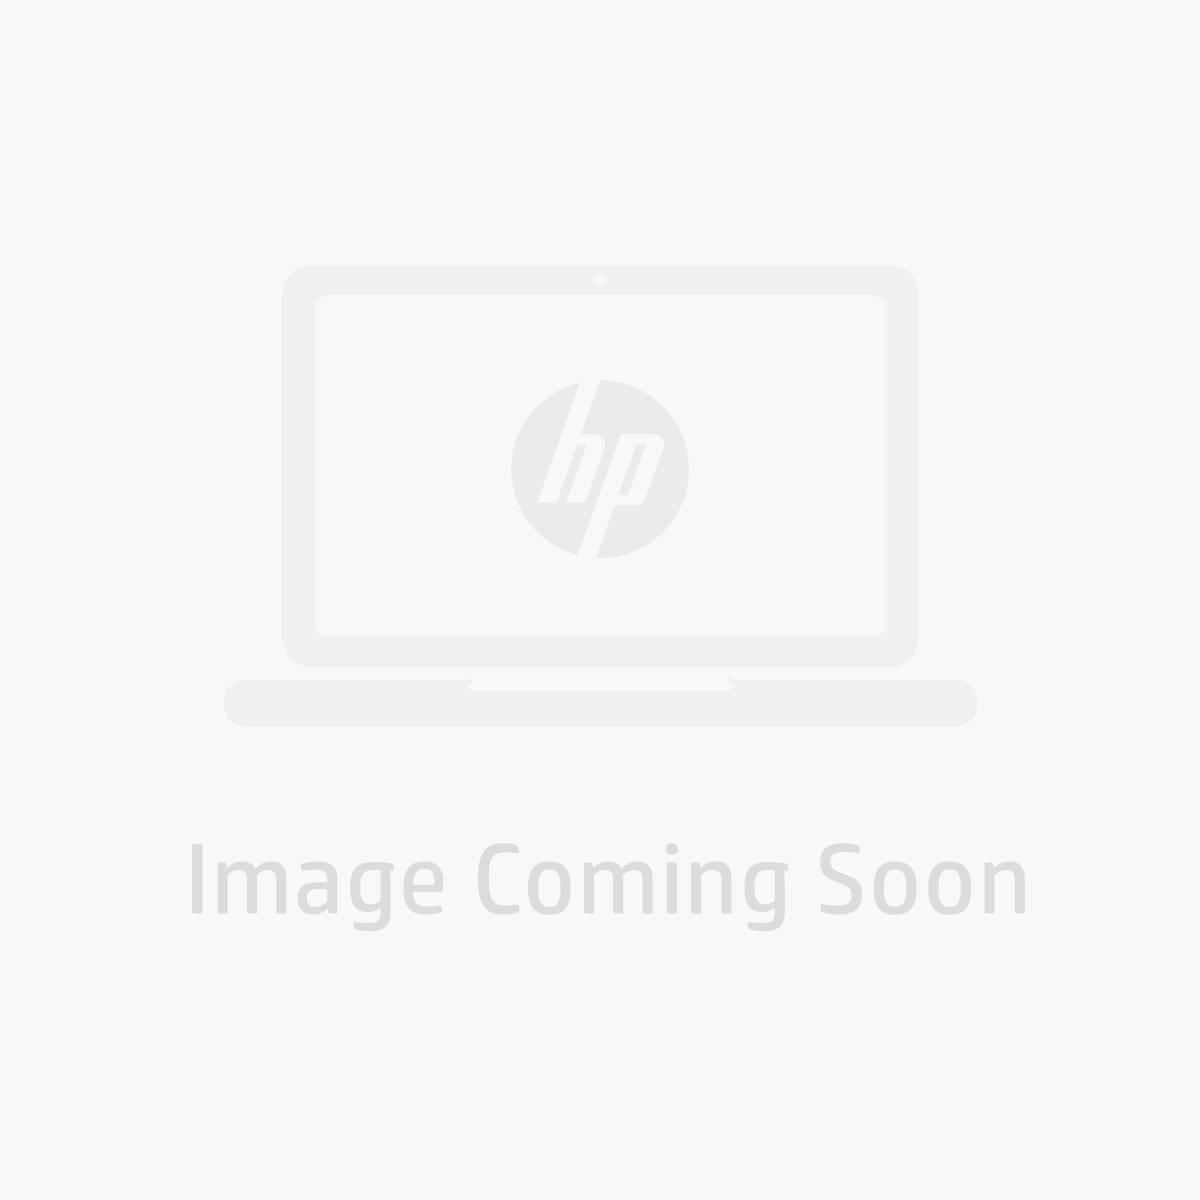 HP Pavilion i5 8th Gen 690-002ni Gaming Desktop with NVIDIA® GeForce® GTX 1050Ti in Black